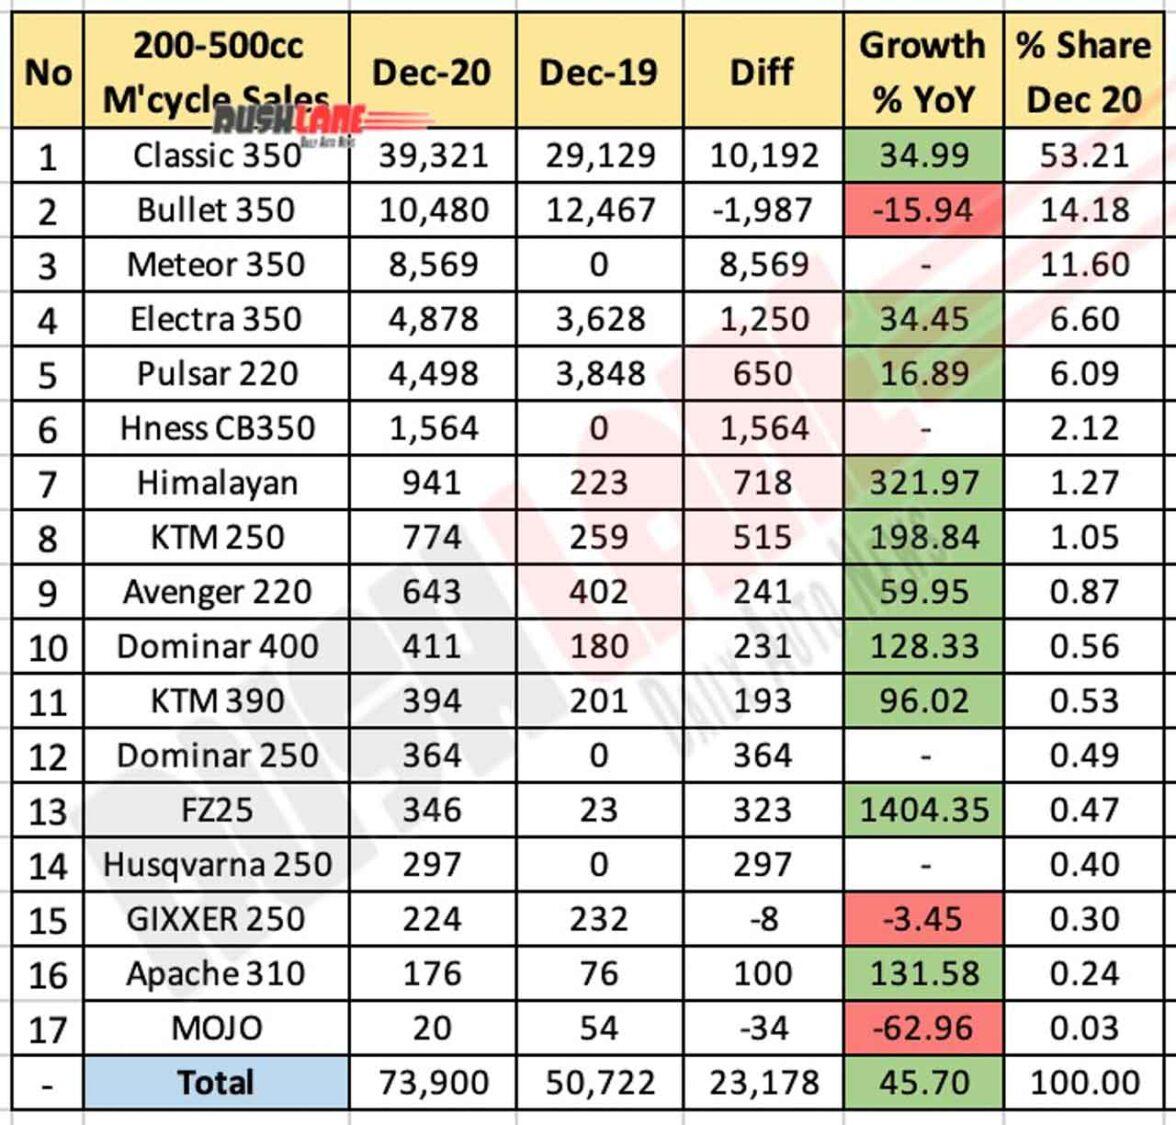 Motorcycle sales (200cc-500cc) segment for Dec 2020